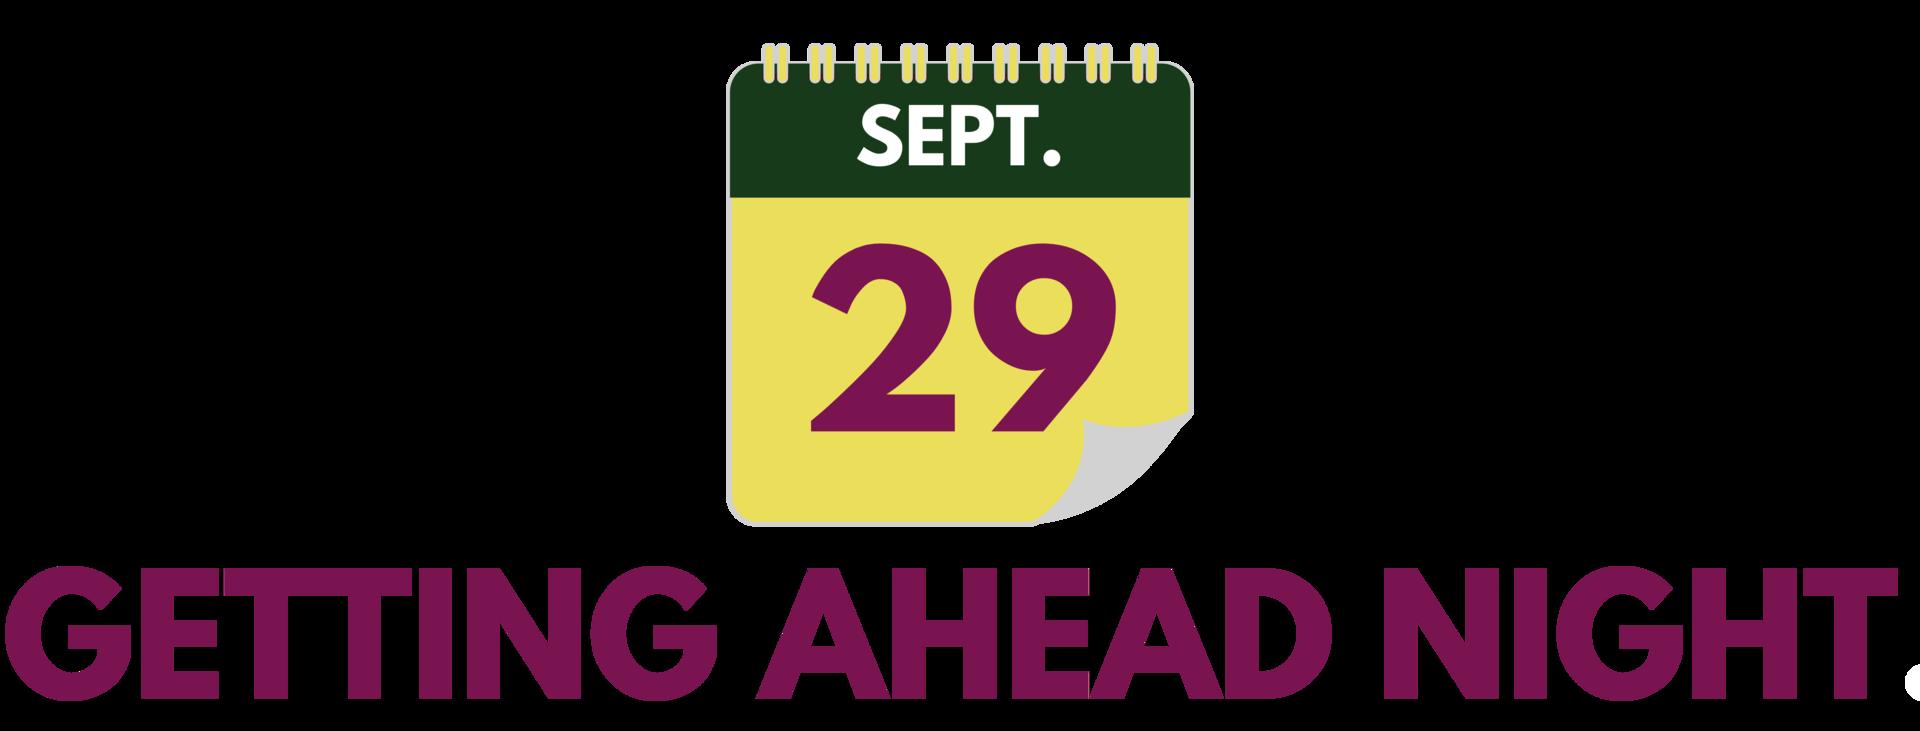 Septh 29th